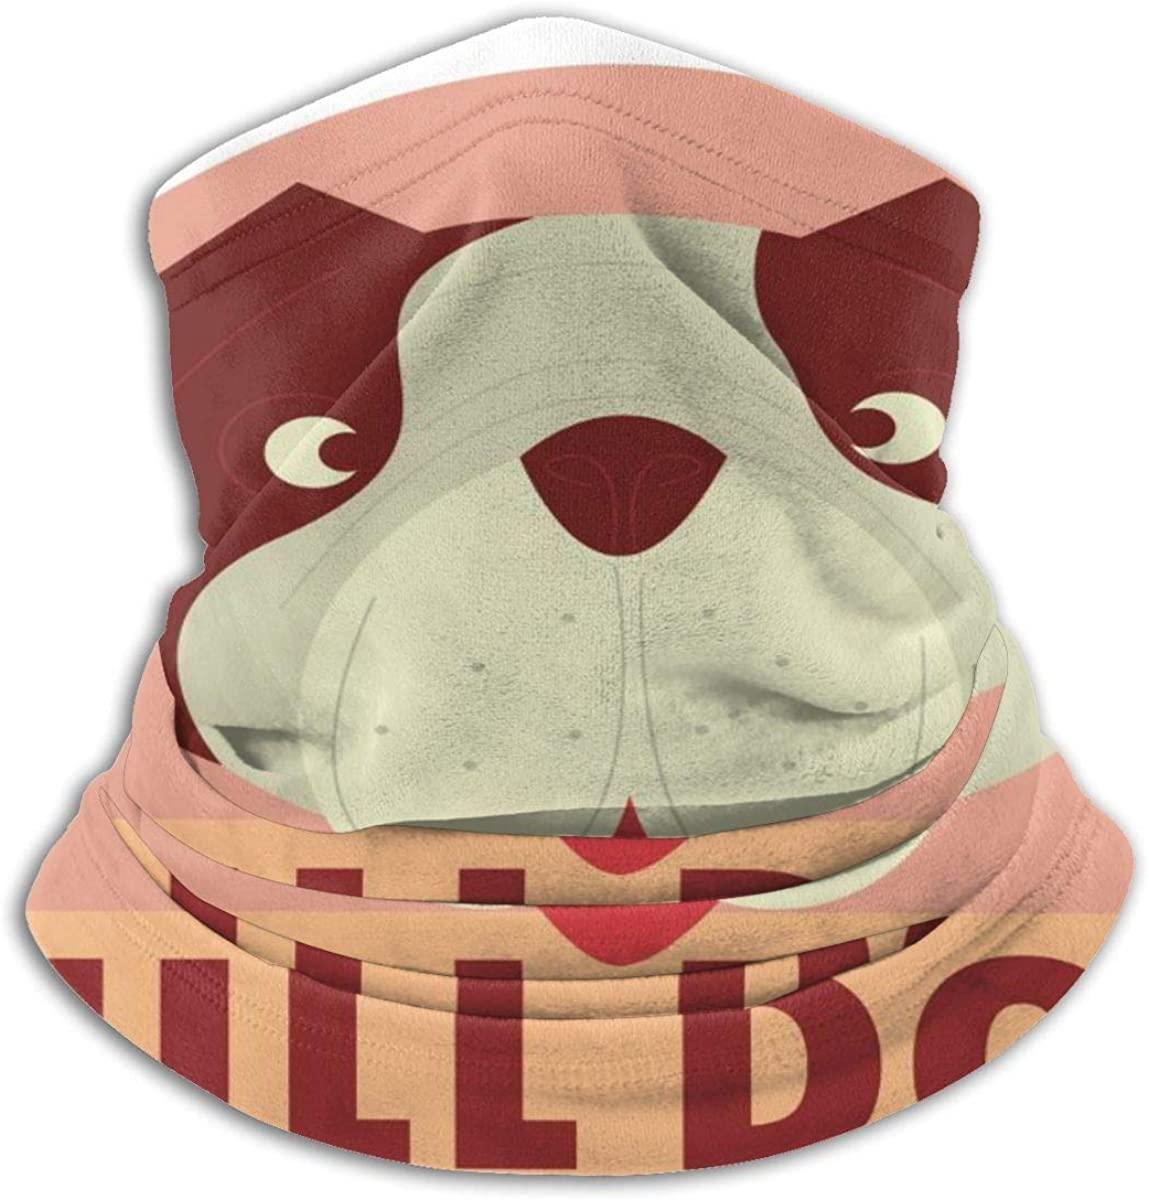 Face Mask, Neck Gaiter, Bull Dog Bandana, Balaclava Windproof Anti Dust Magic Scarf for Women Men